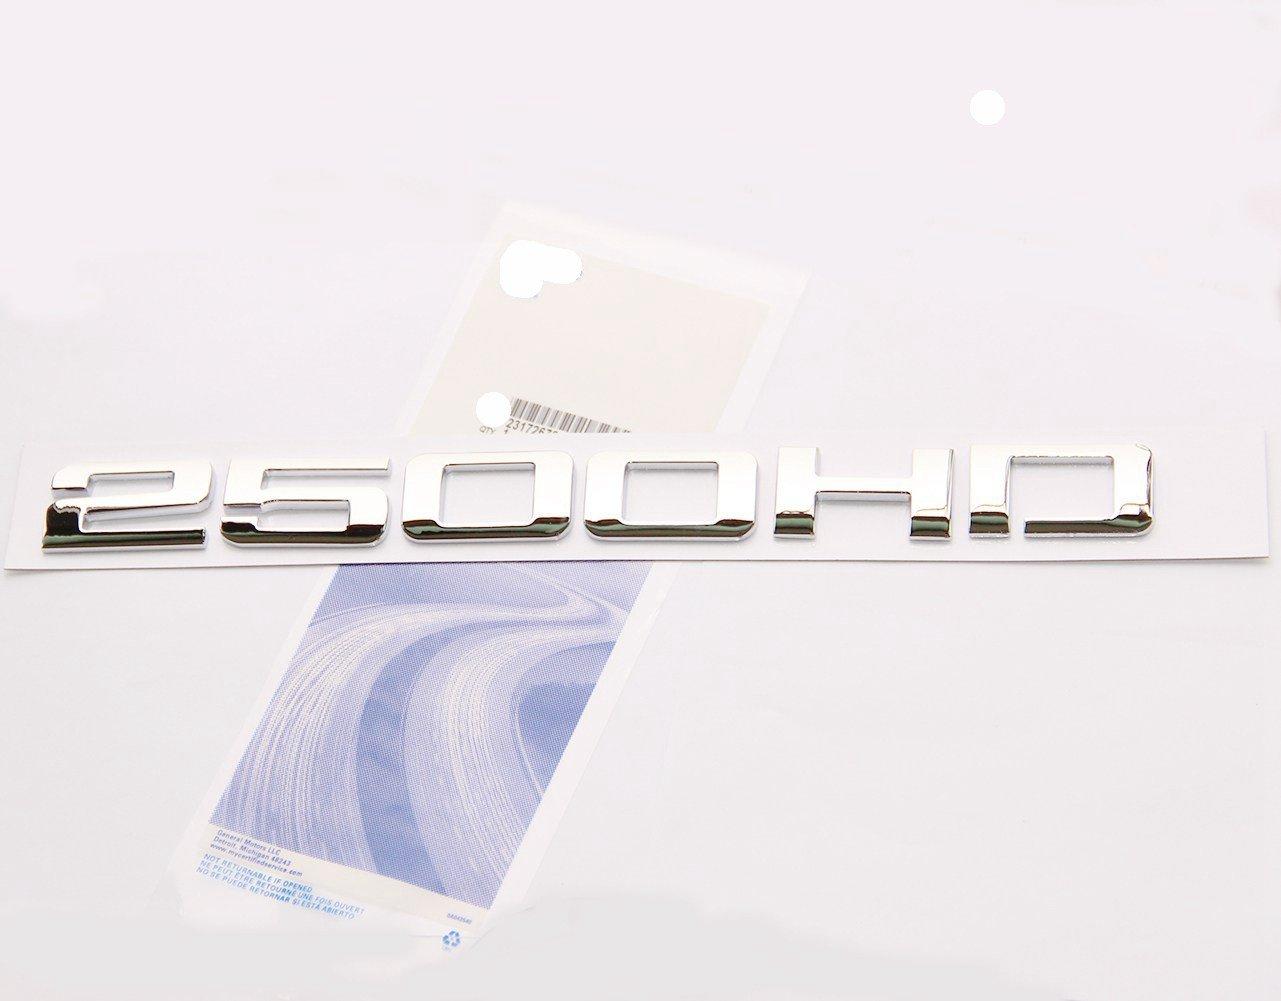 Yoaoo® 1pcs OEM Chrome 2500hd 2500 Hd Nameplate Emblem Alloy Badge for Gm Silverado Sierra 1 Pieces